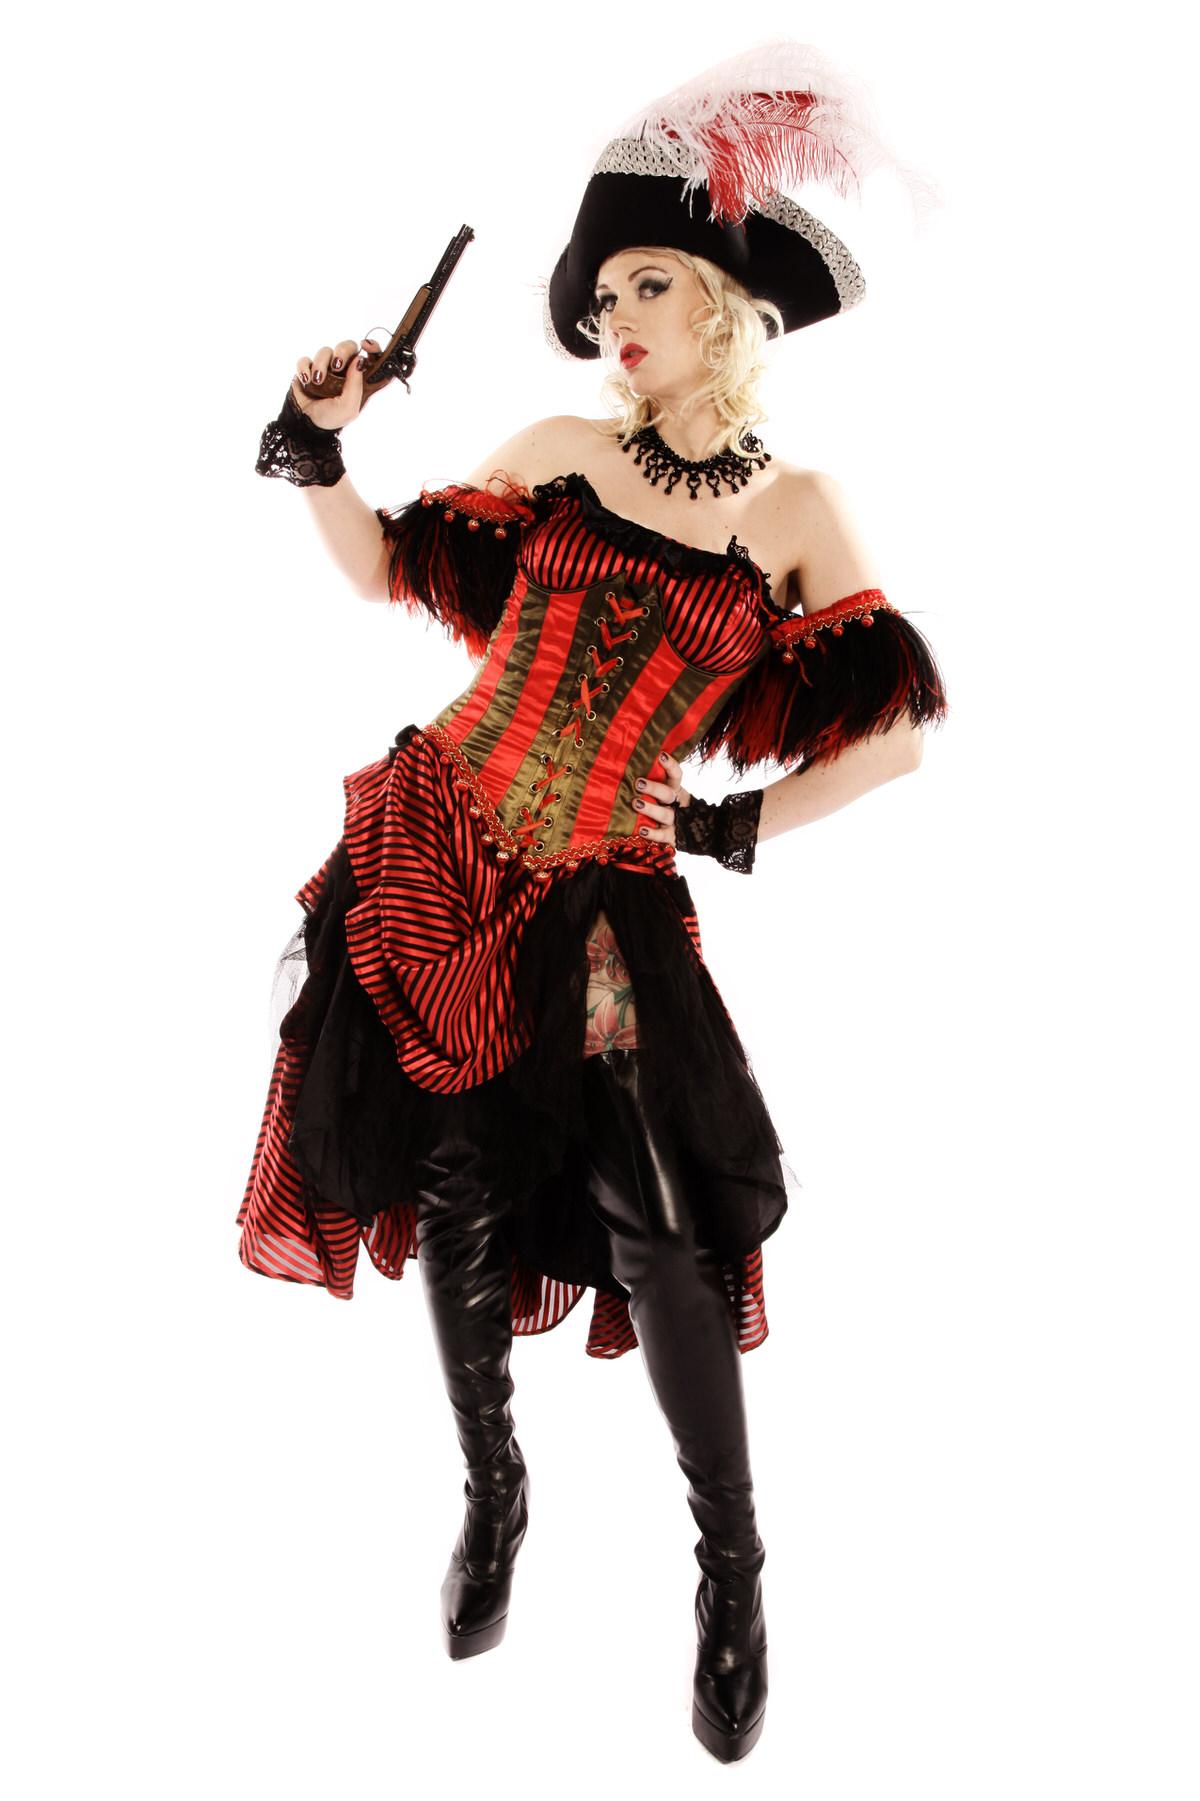 SWASHBUCKLER PIRATE LADY COSTUME W TRICORN HAT